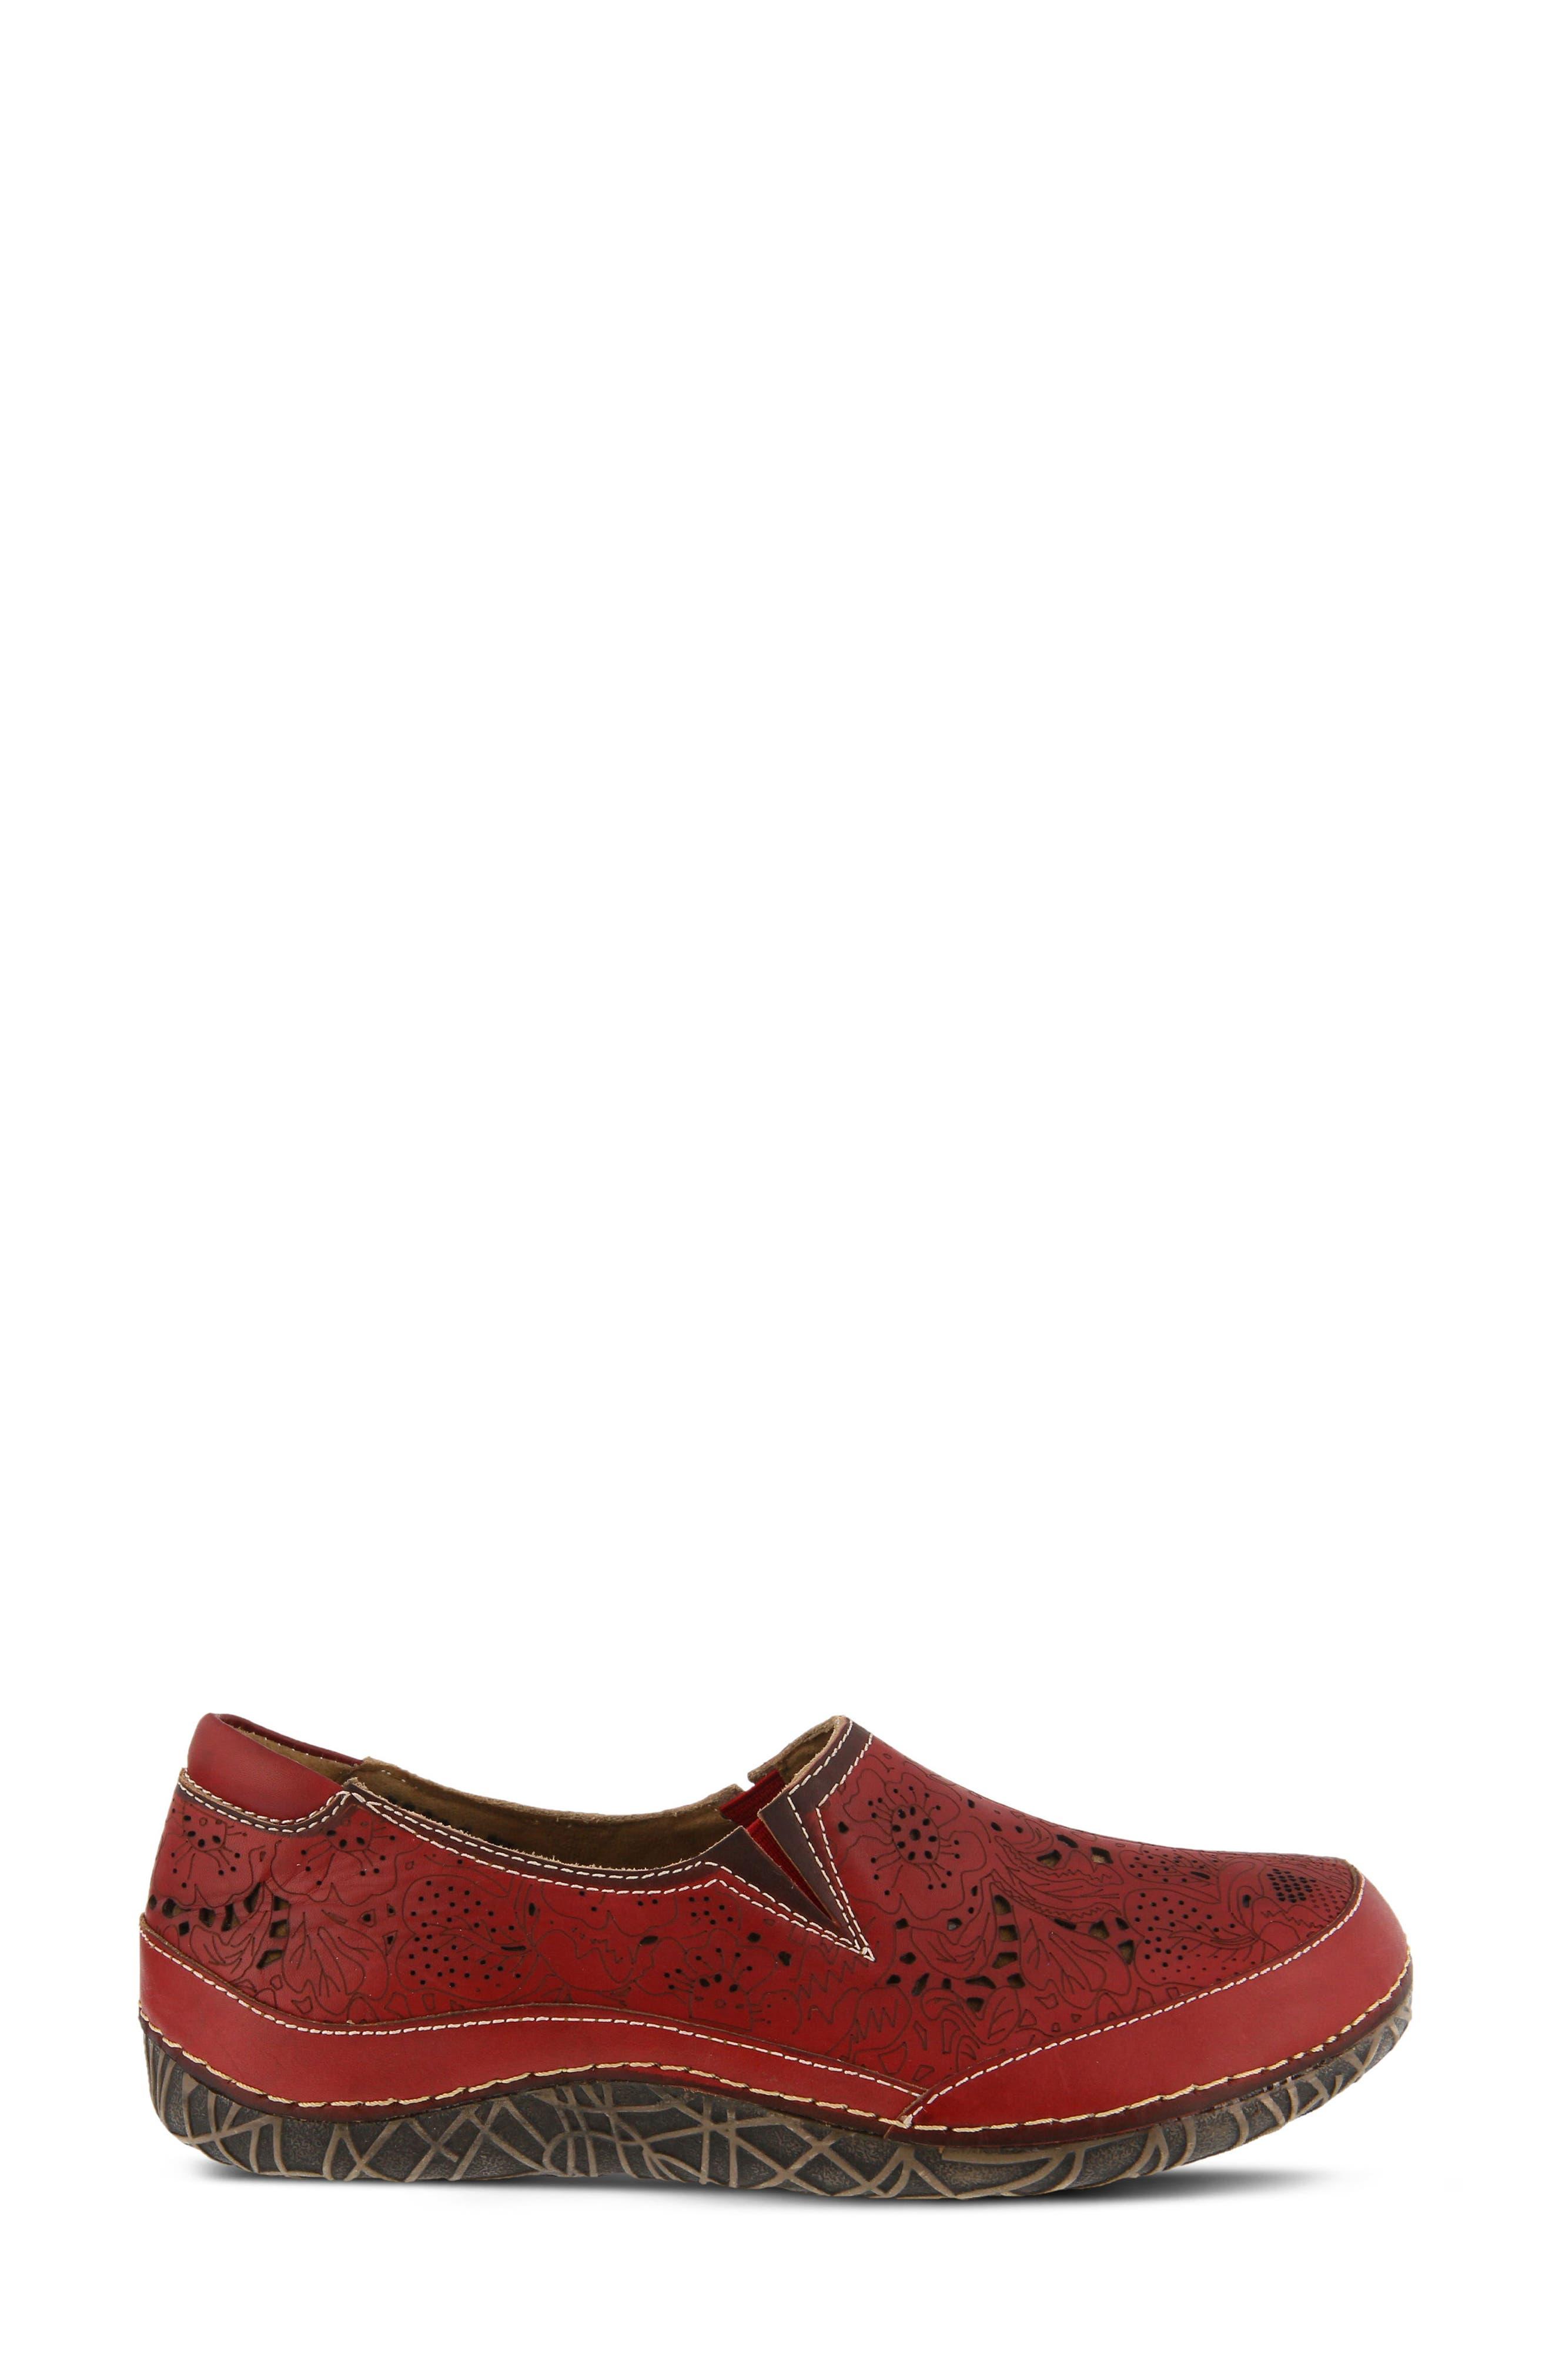 L'Artiste Libora Slip-On Flat,                             Alternate thumbnail 3, color,                             Red Leather